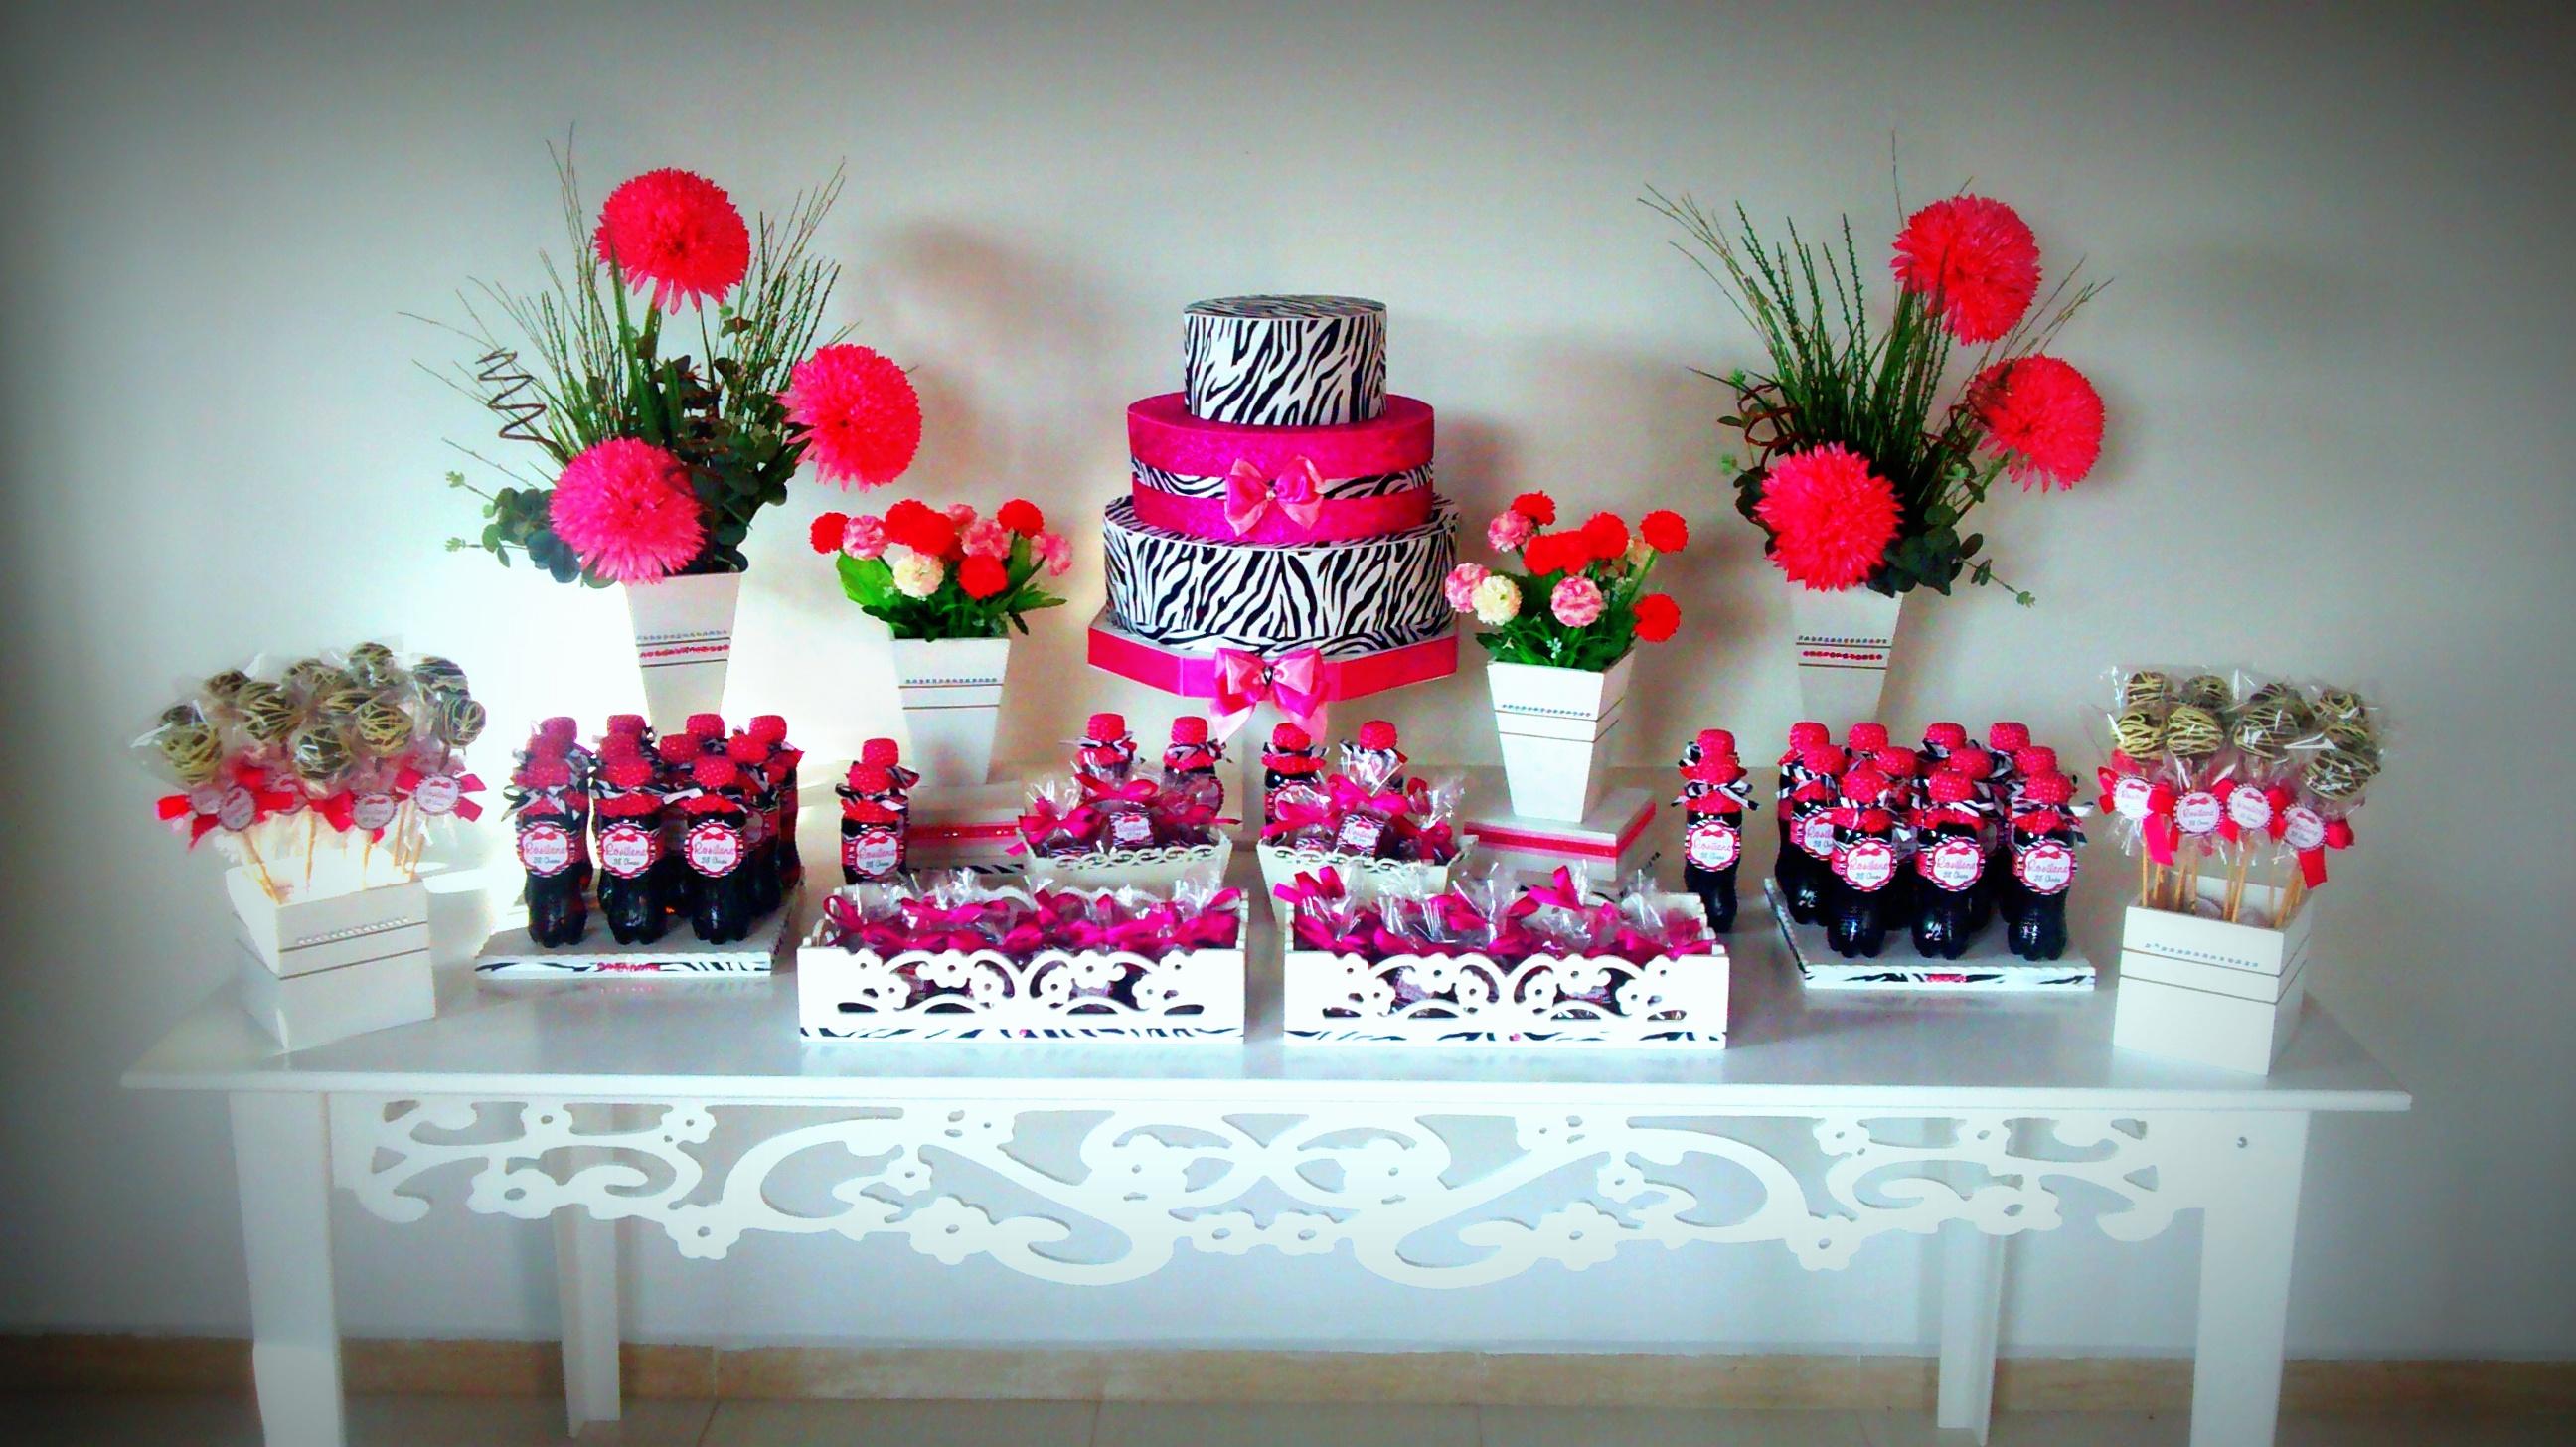 decoracao festa zebra pink:decoracao provencal zebra pink decoracao provencal zebra pink